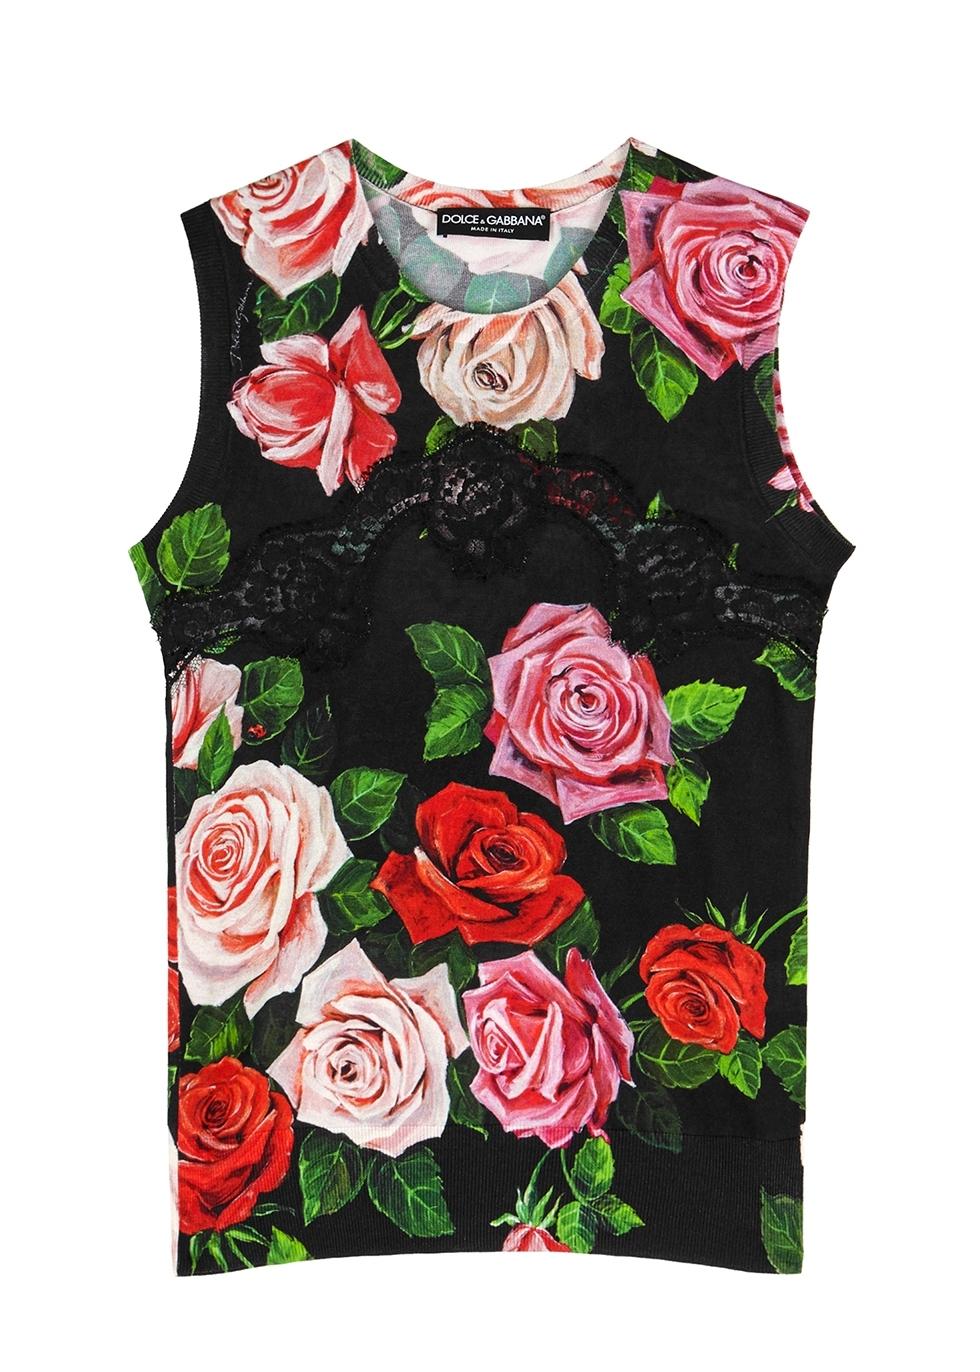 448f8a22c0e5 Dolce   Gabbana - Harvey Nichols